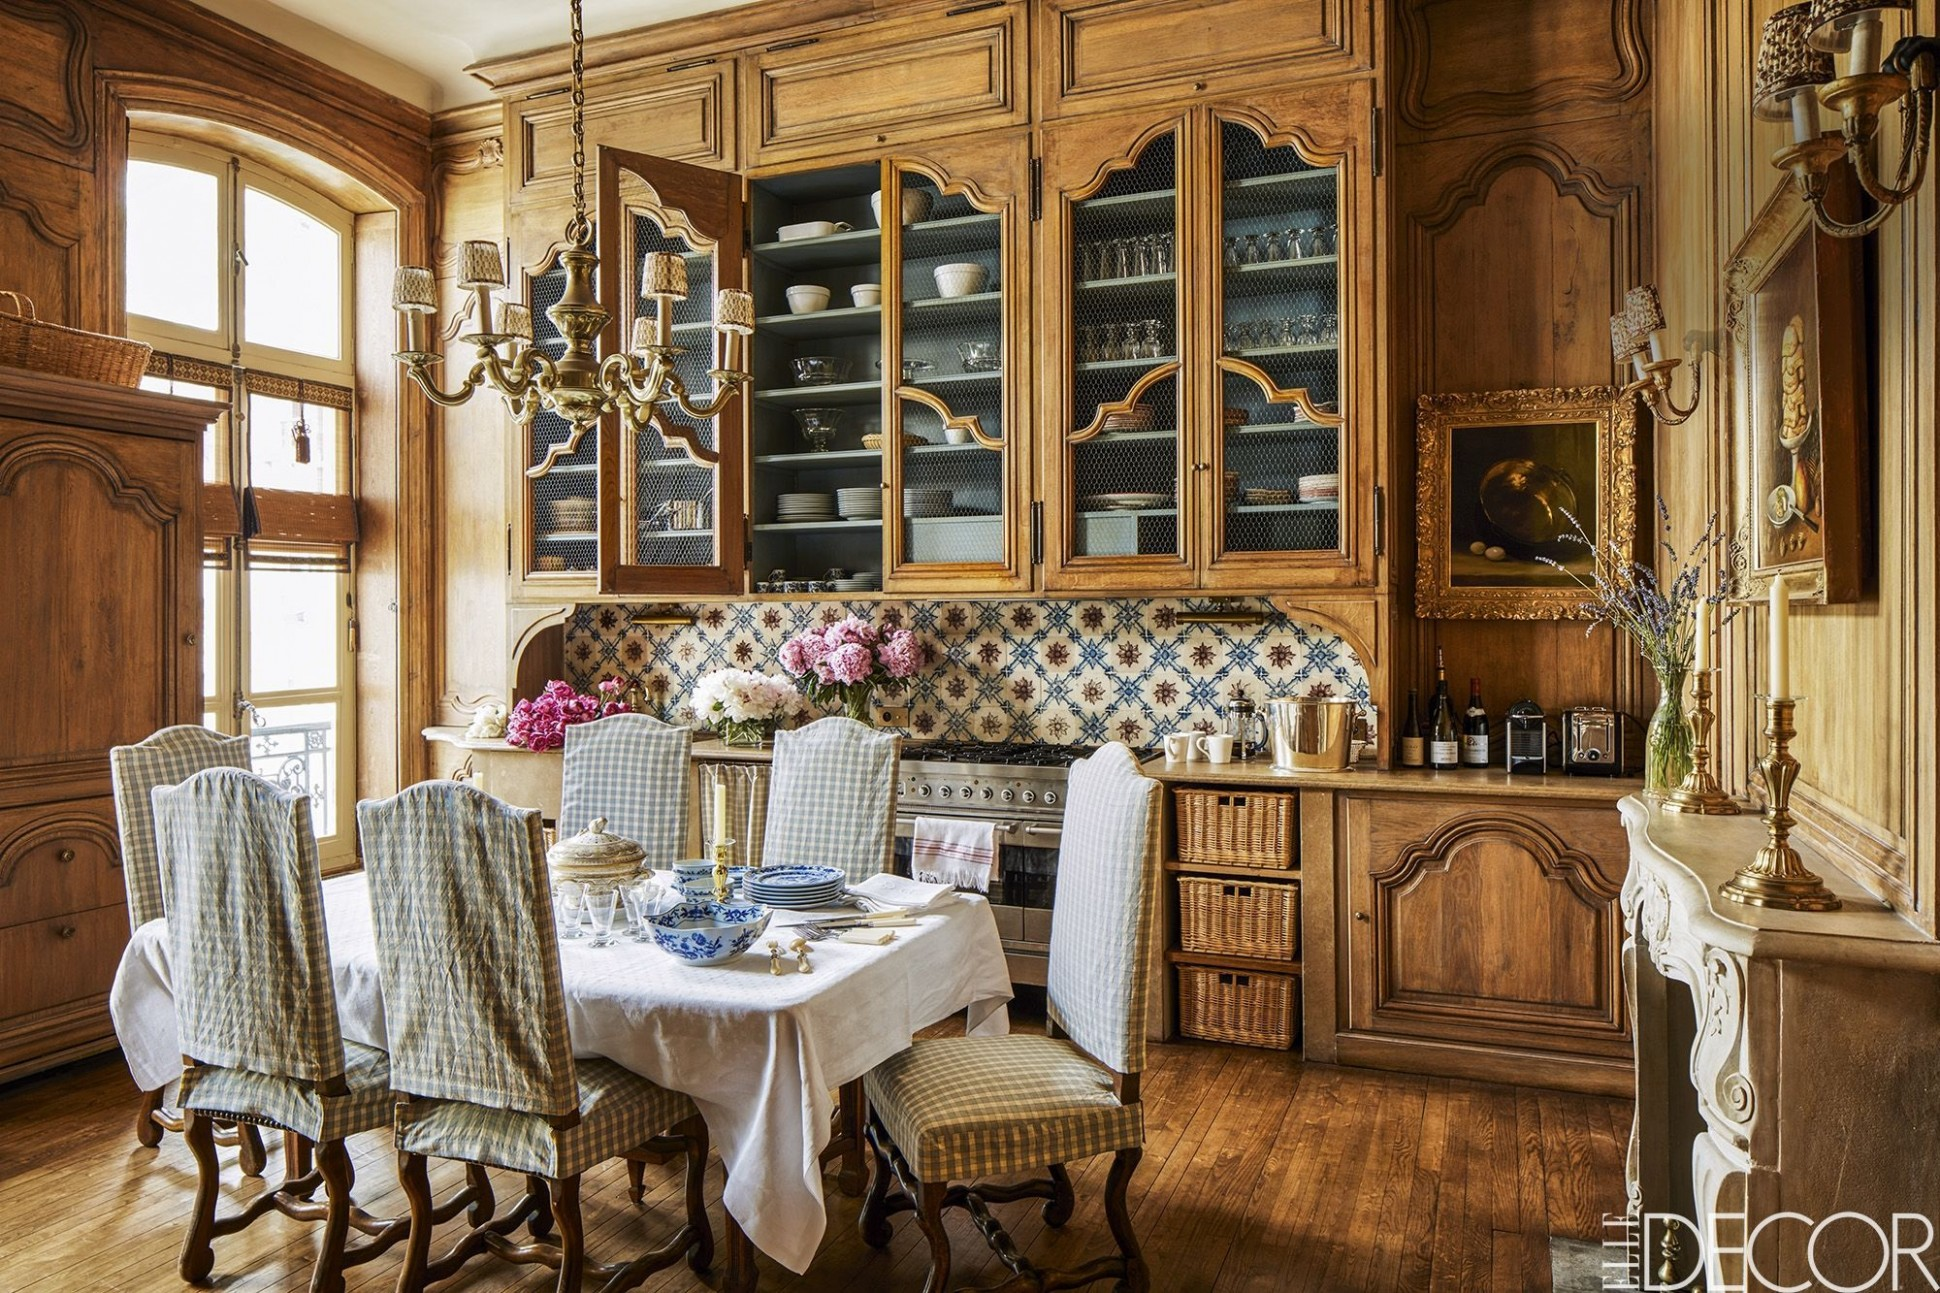 11 Rustic Dining Room Ideas - Farmhouse Style Dining Room Designs - Dining Room Ideas Country